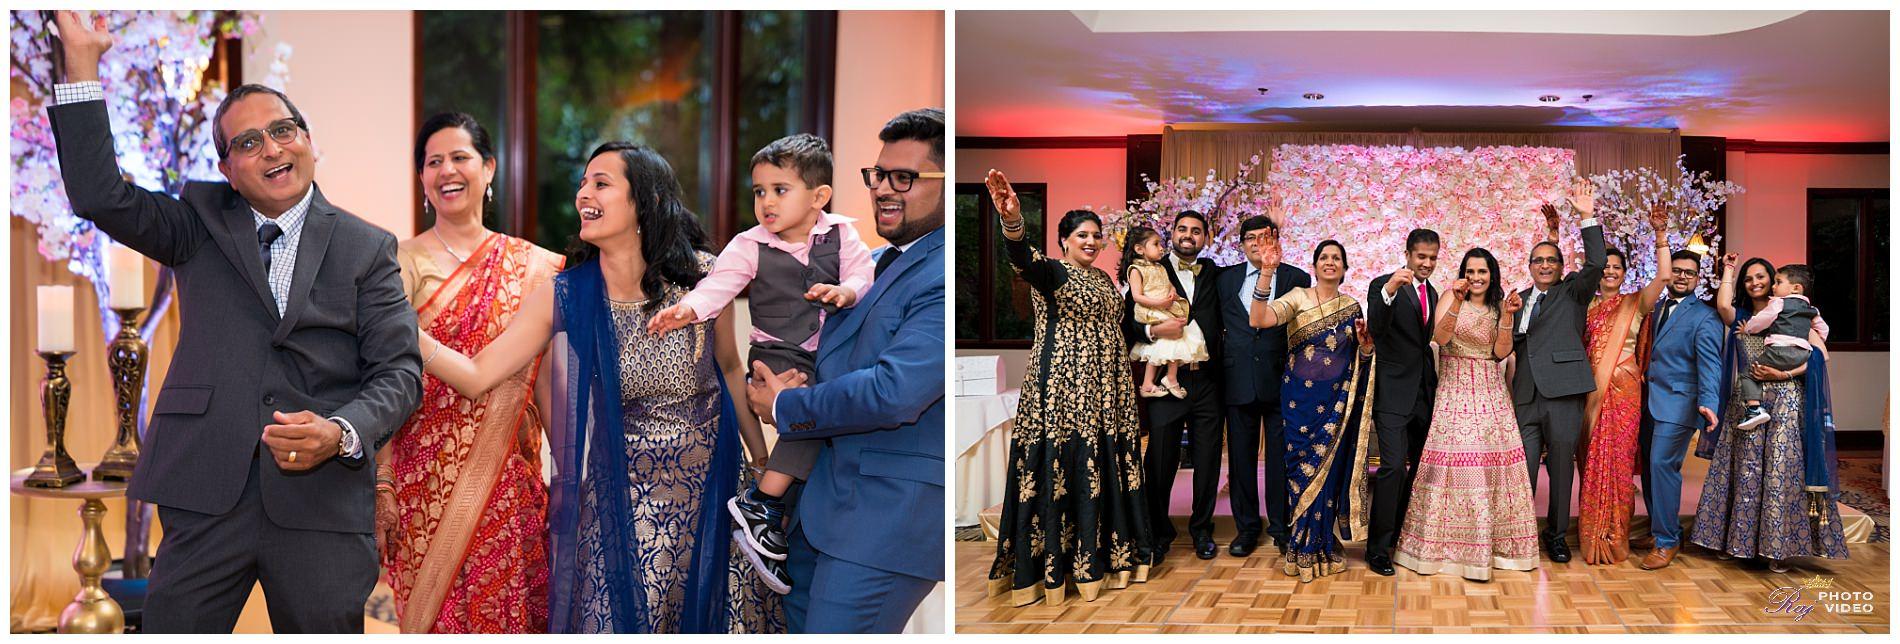 Martinsville-Gardens-NJ-Indian-Wedding-Ruchi-Vishal-54.jpg